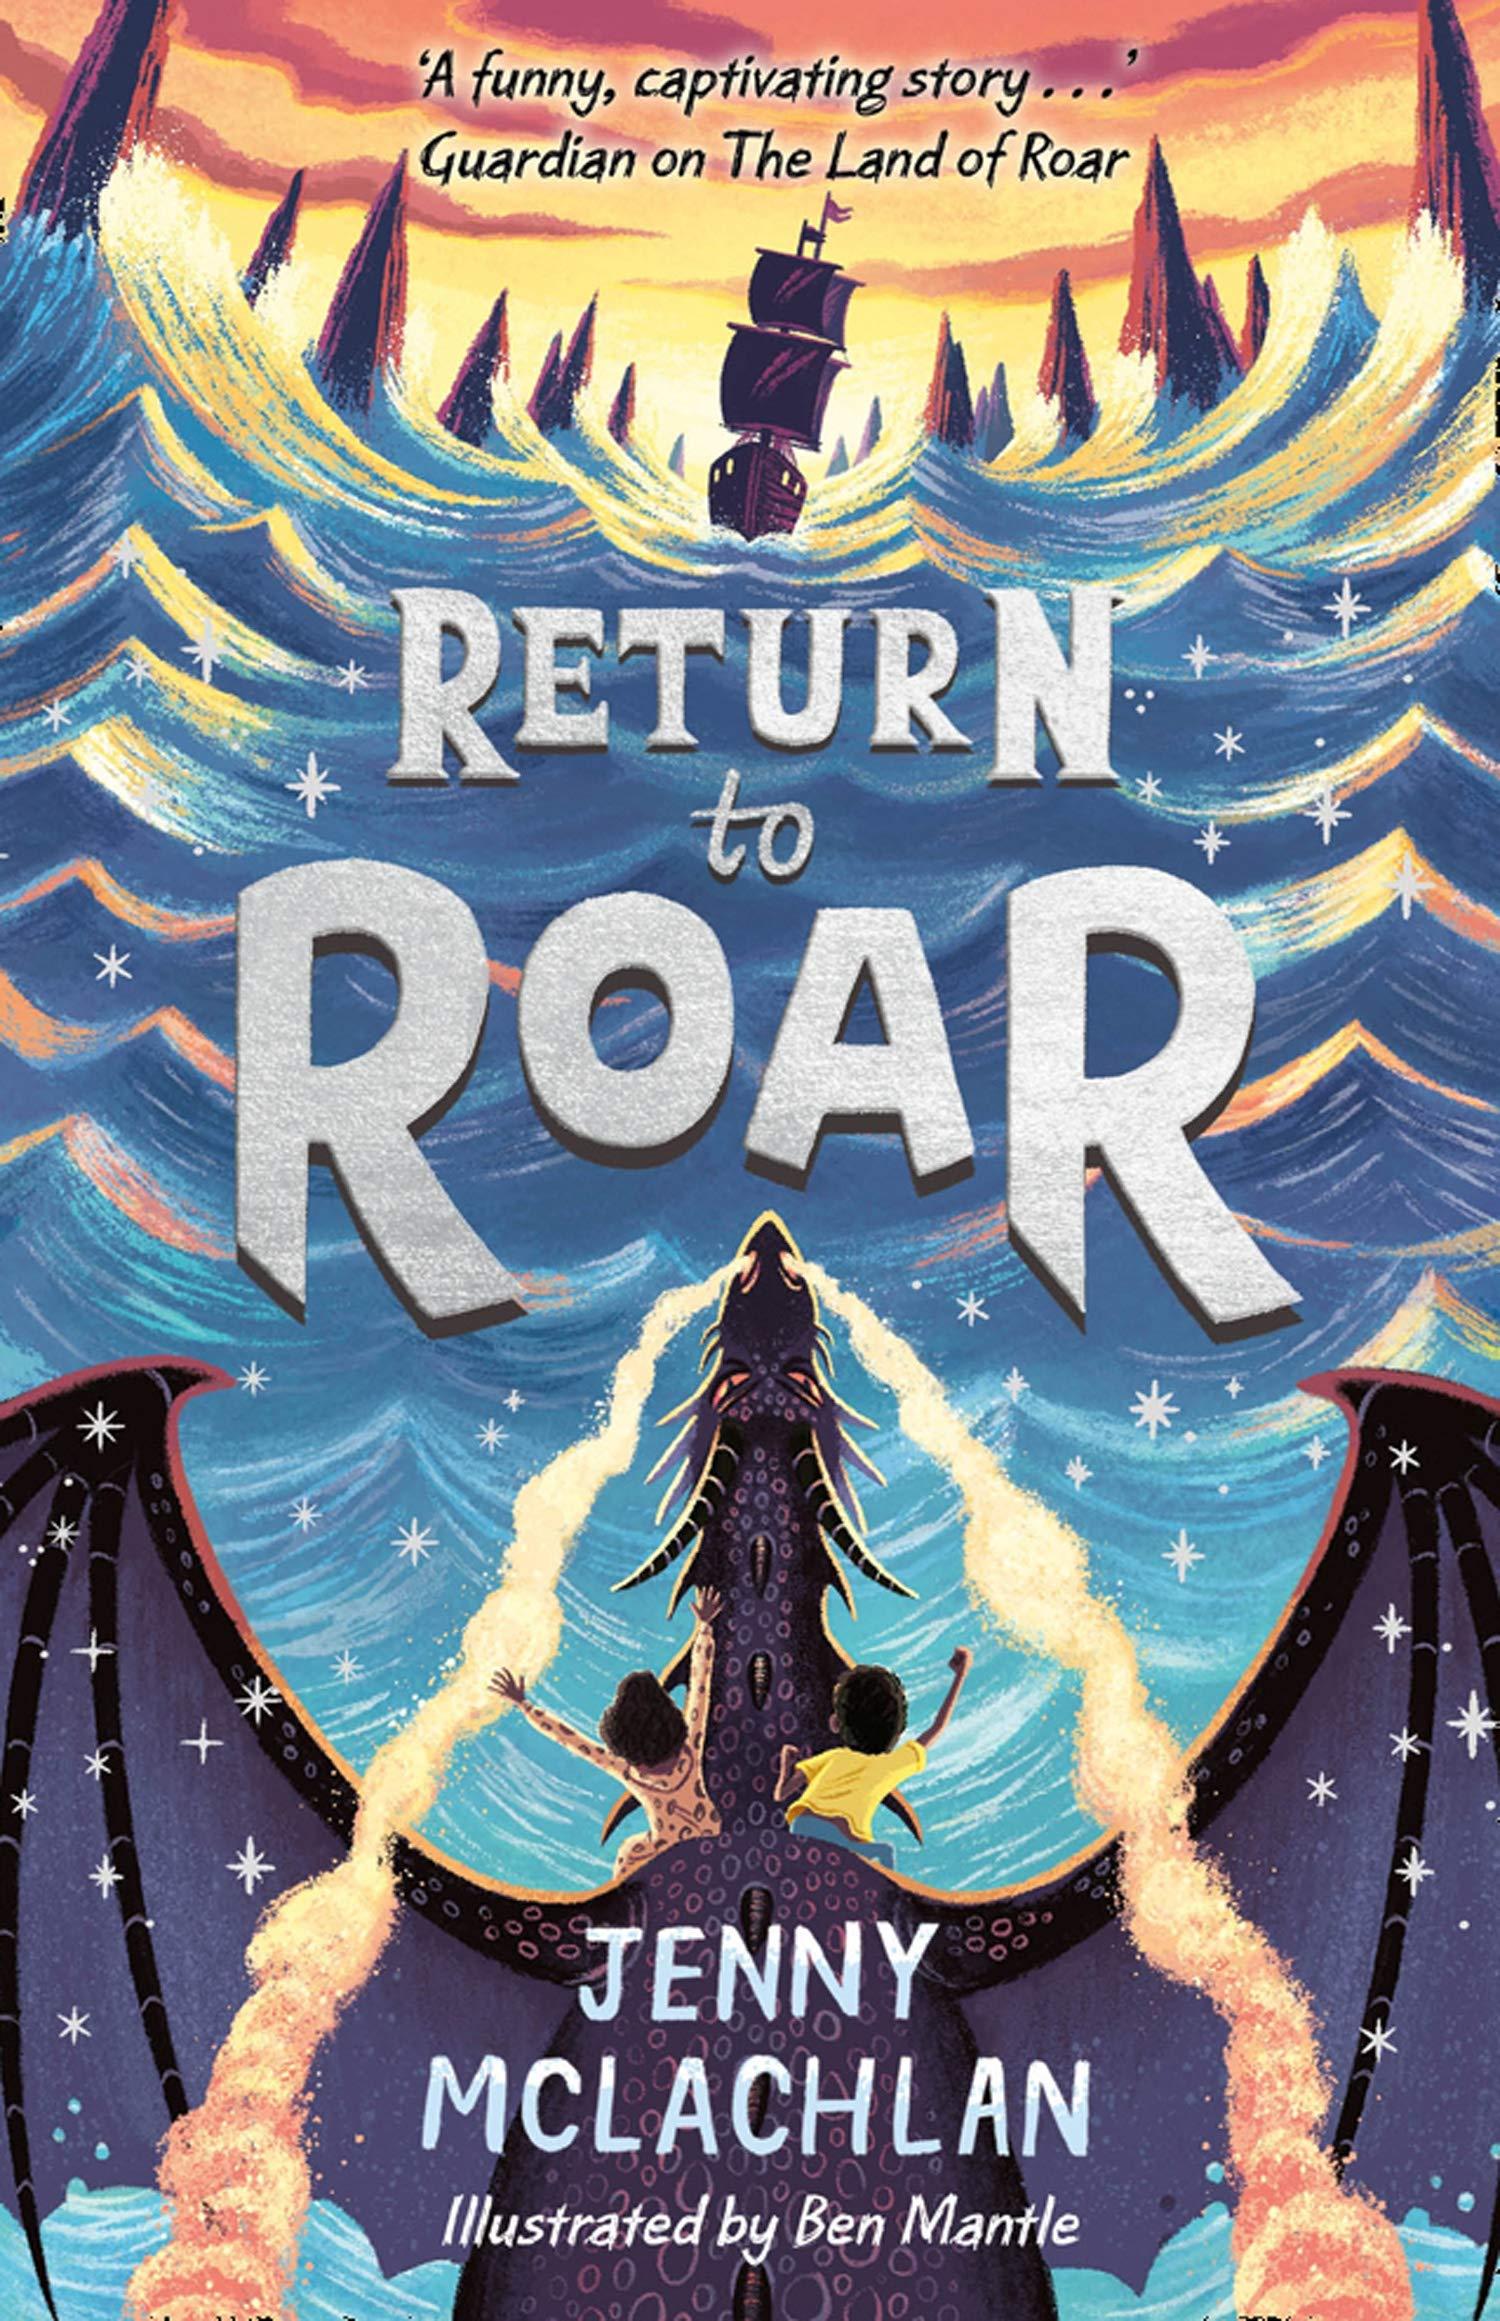 Book Review: Return to Roar